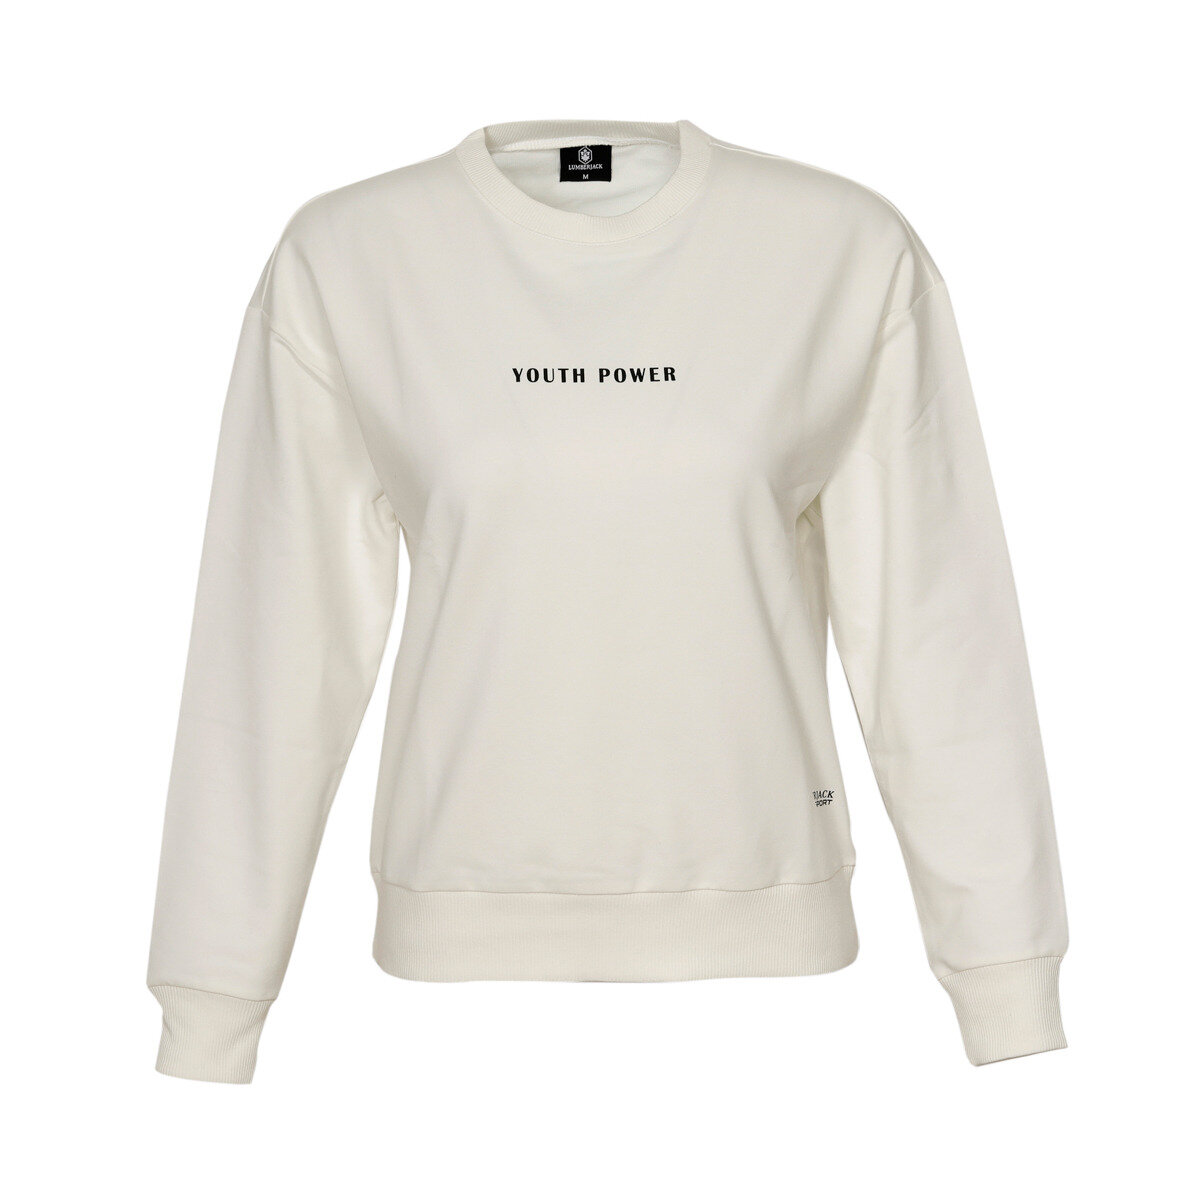 FLO W-1541 CASH SWEATSHIRT Ecru Women Sweatshirts LUMBERJACK